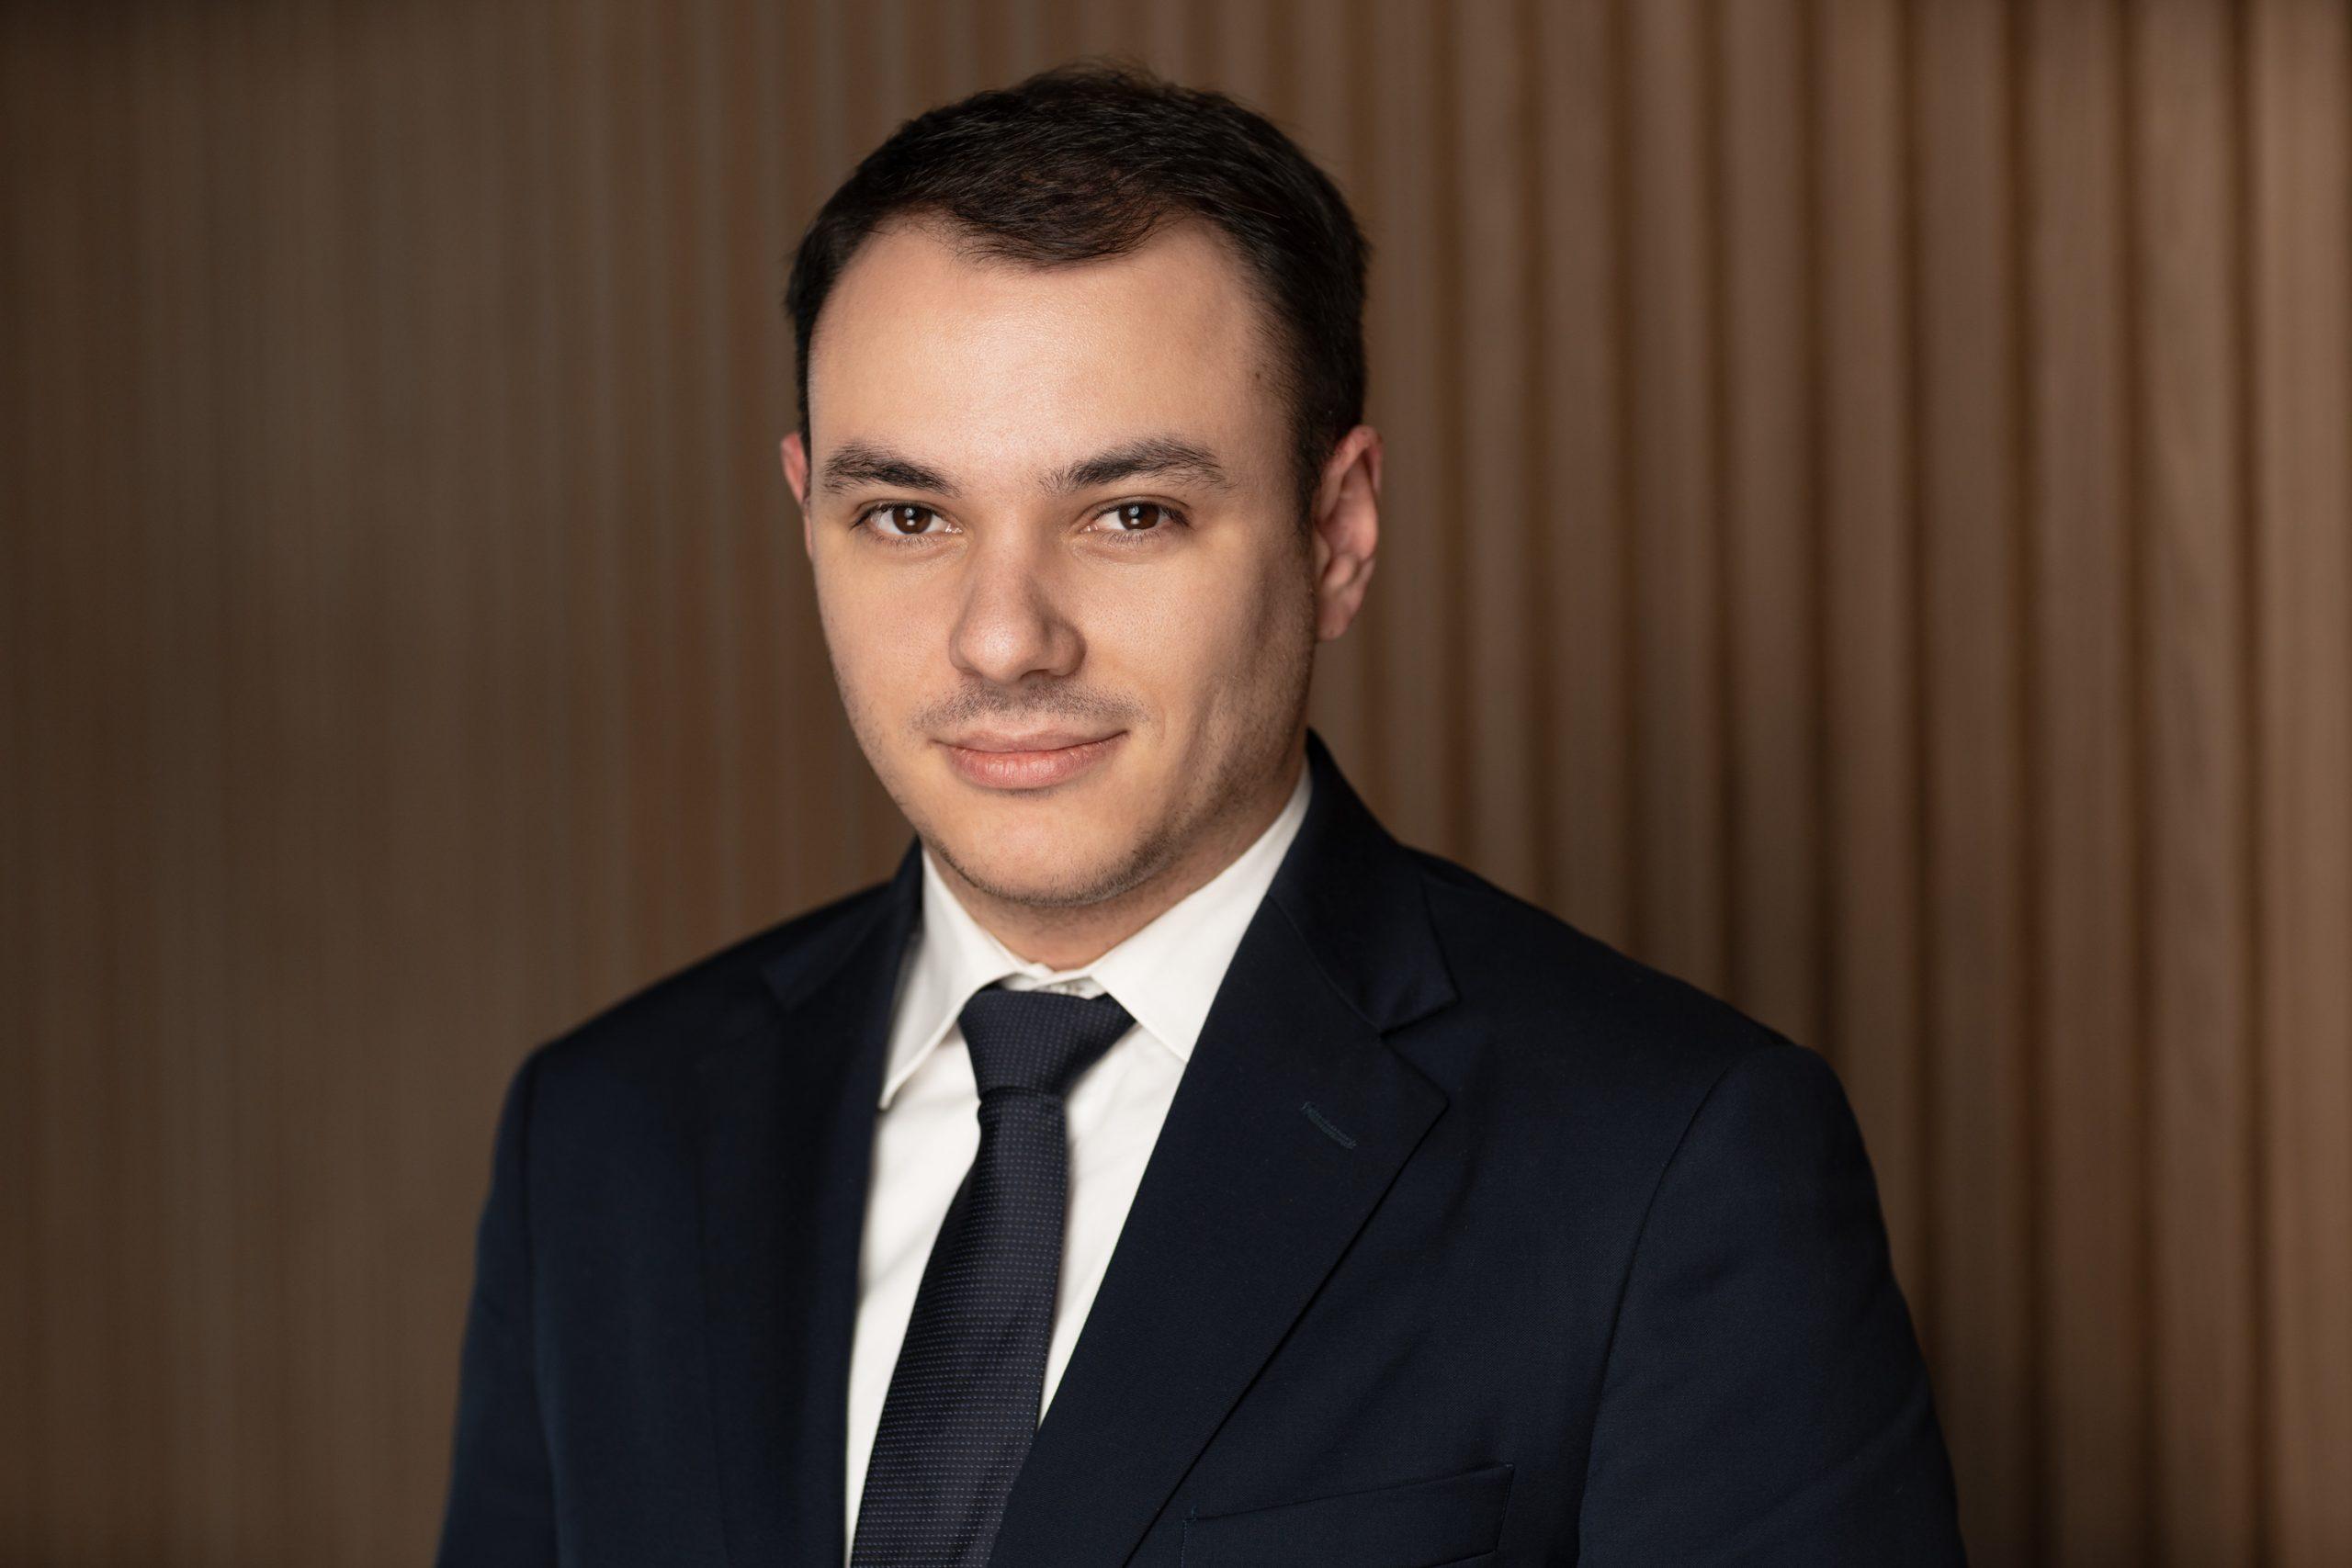 Andrei Konya